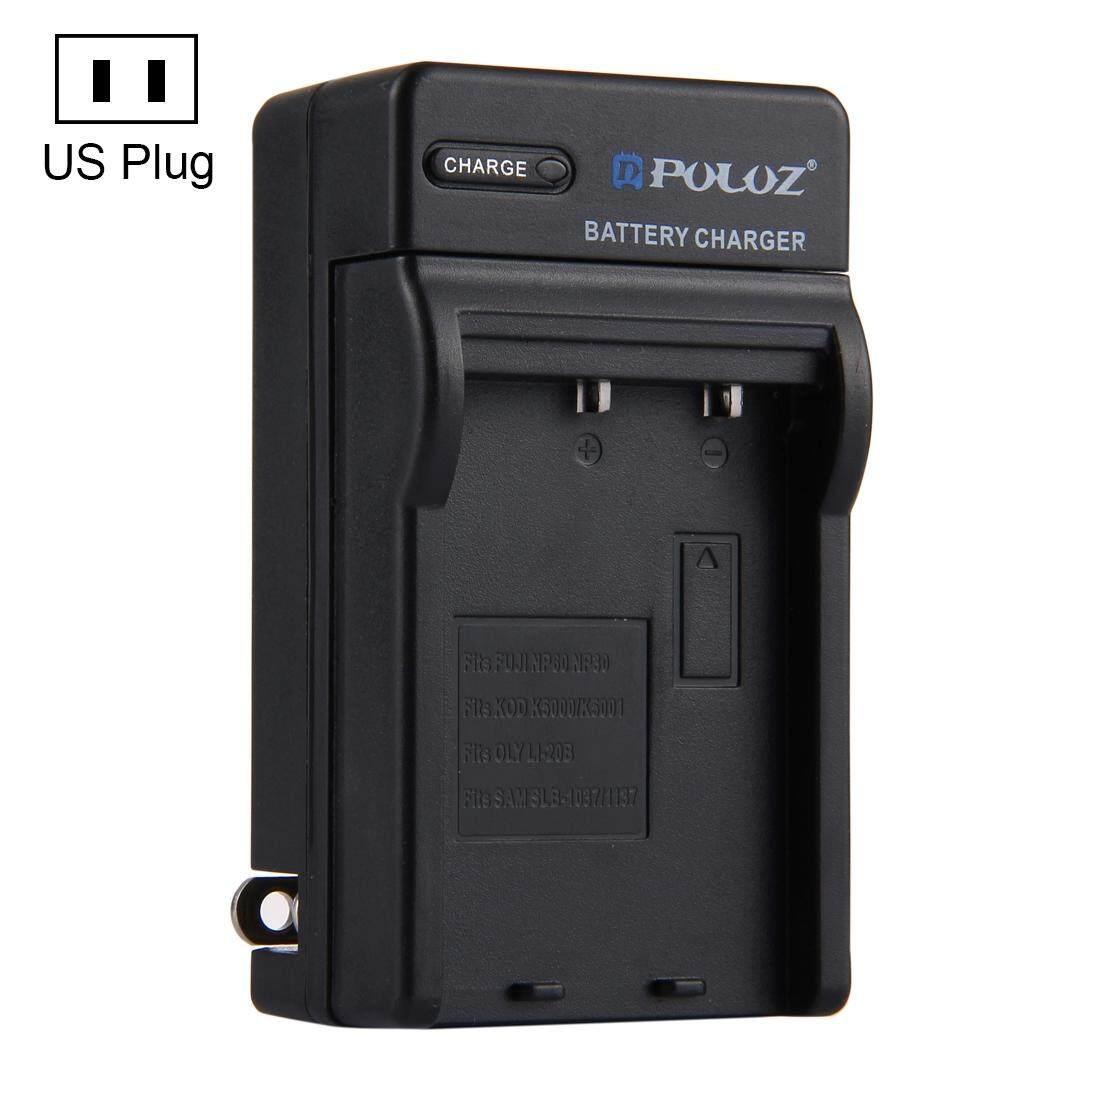 PULUZ US Plug Battery Charger for Fujifilm NP-60 / NP-30, Kodak K5000 / K5001, Olympus LI-20B, Samsung SLB-1037 / 1137 Battery - intl